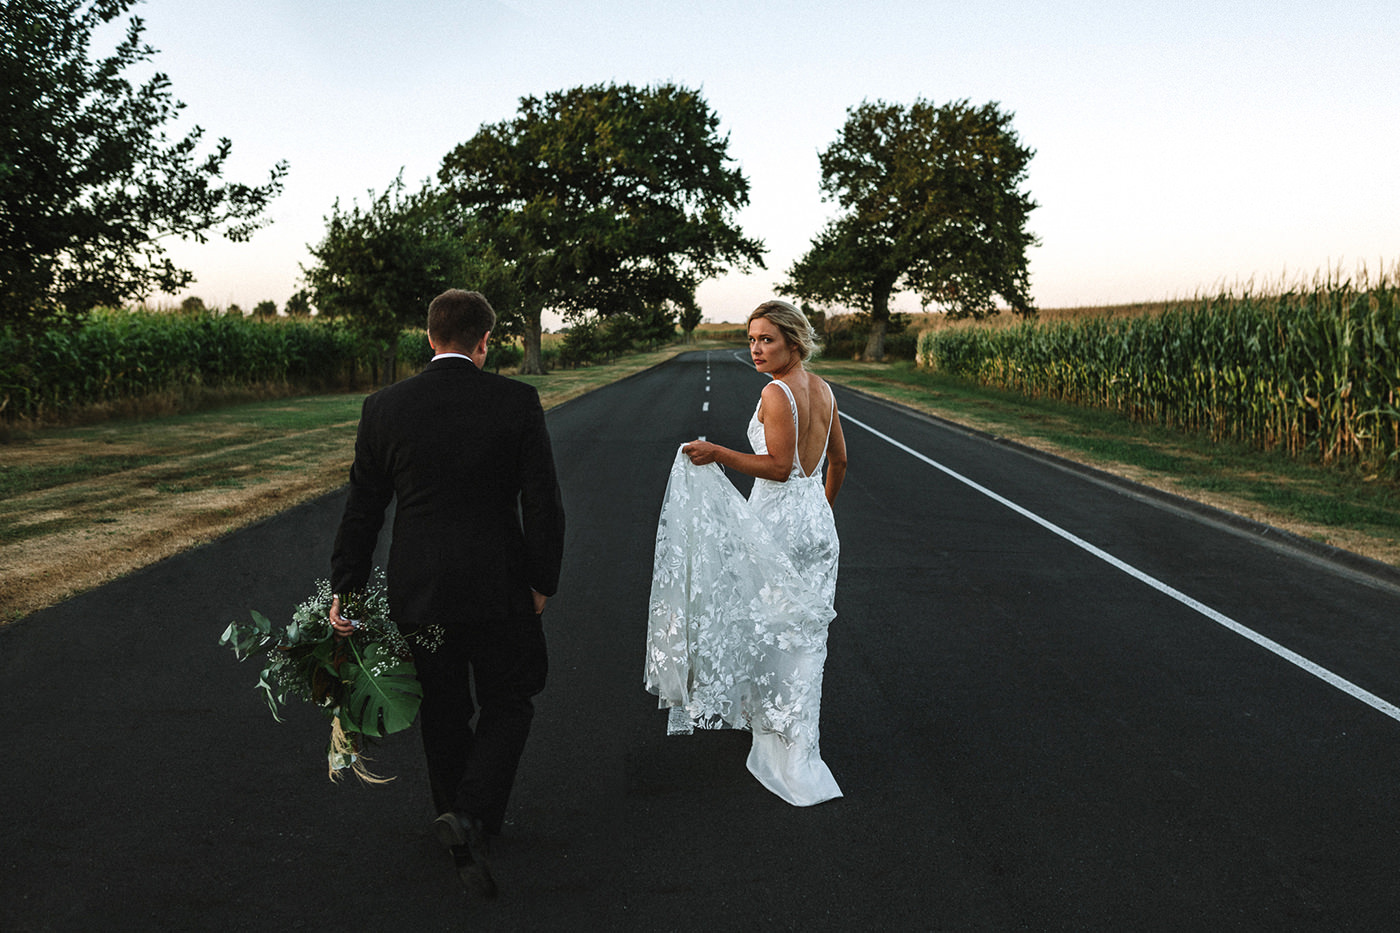 wedding_photographer_nz-00016